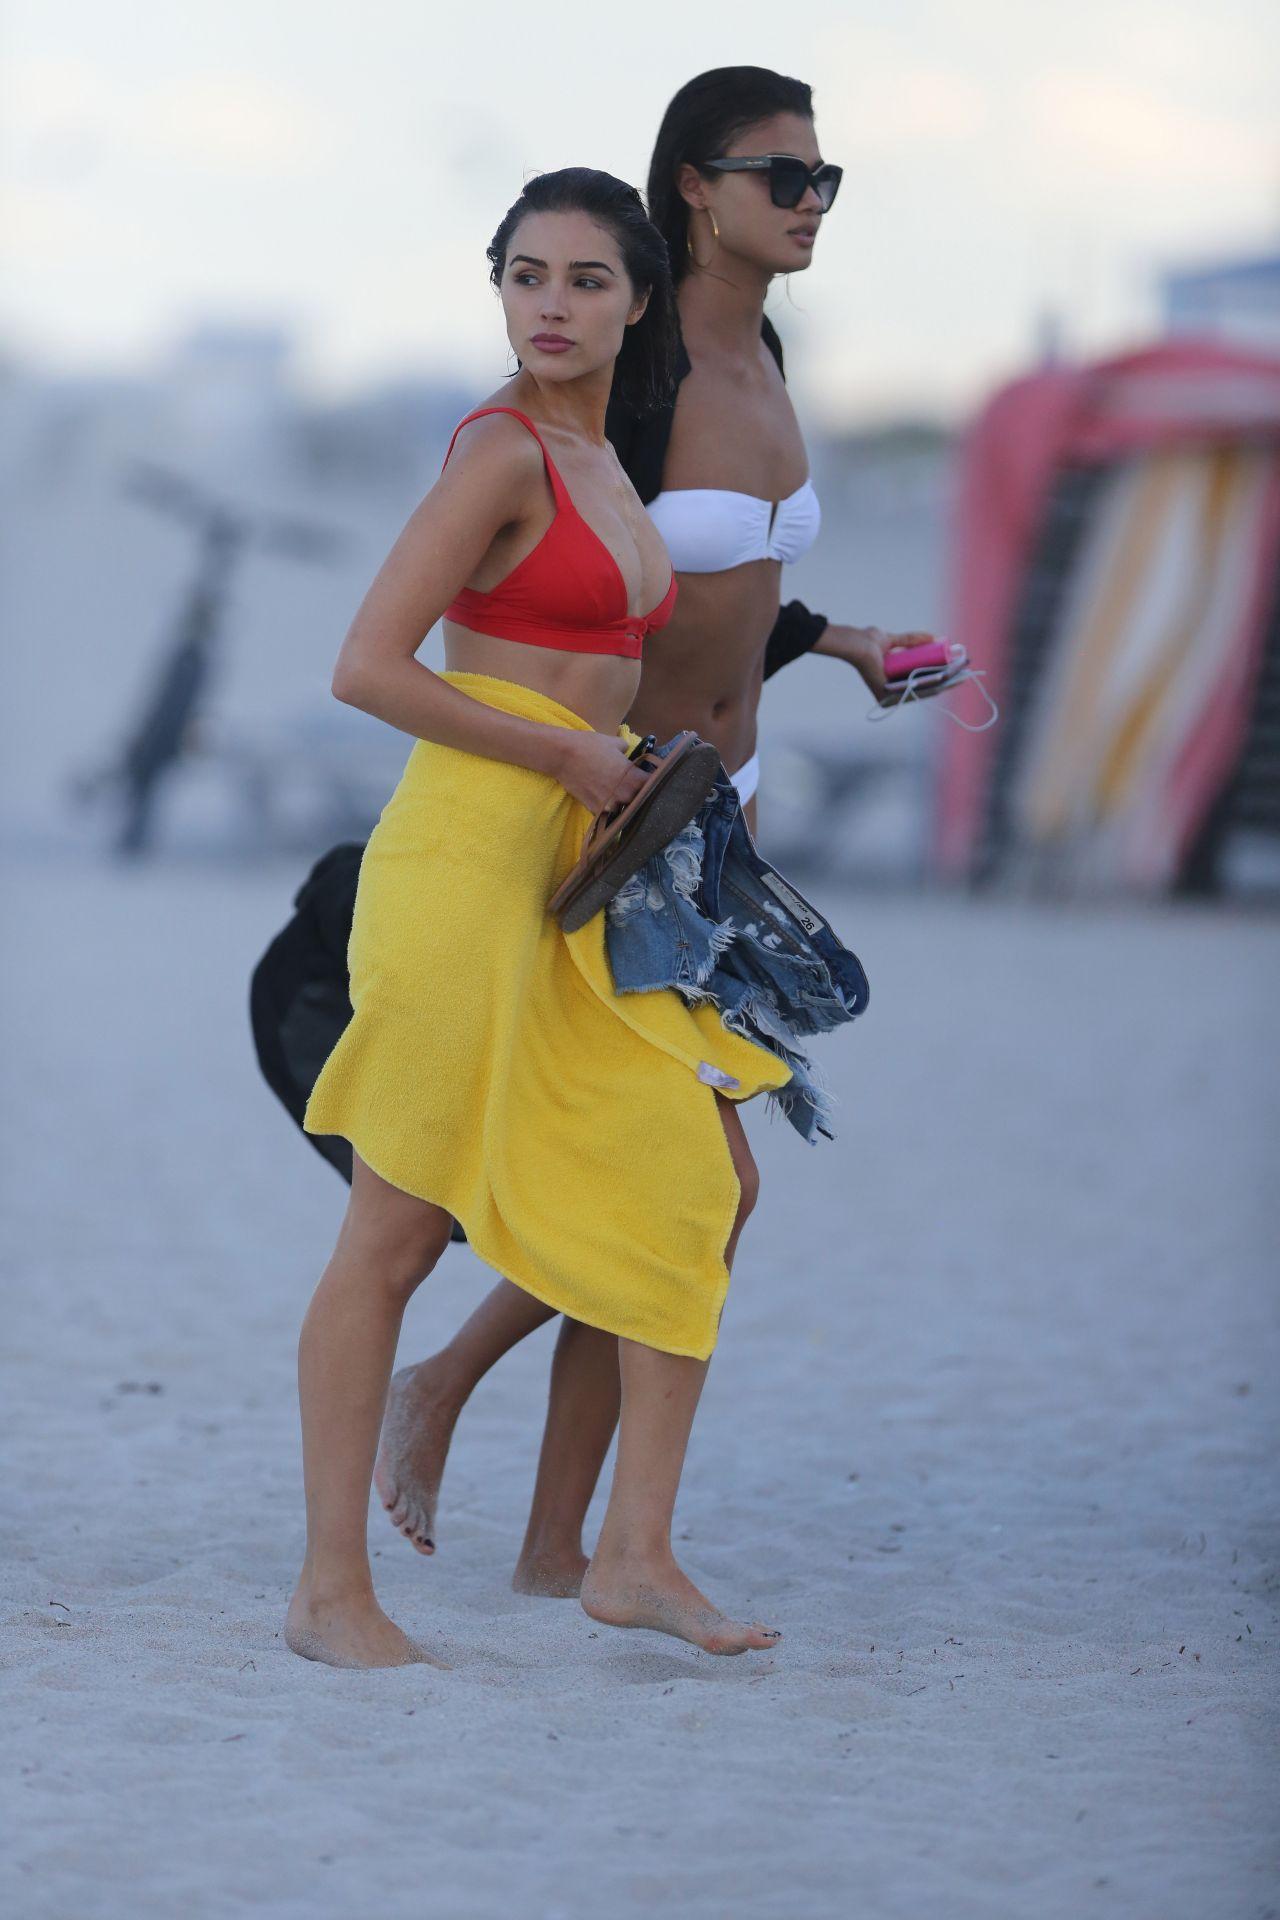 Shanina Shaik Caroline Lowe Olivia Culpo and Daniela Braga in Bikini Photoshoot in Miami Beach Pic 35 of 35